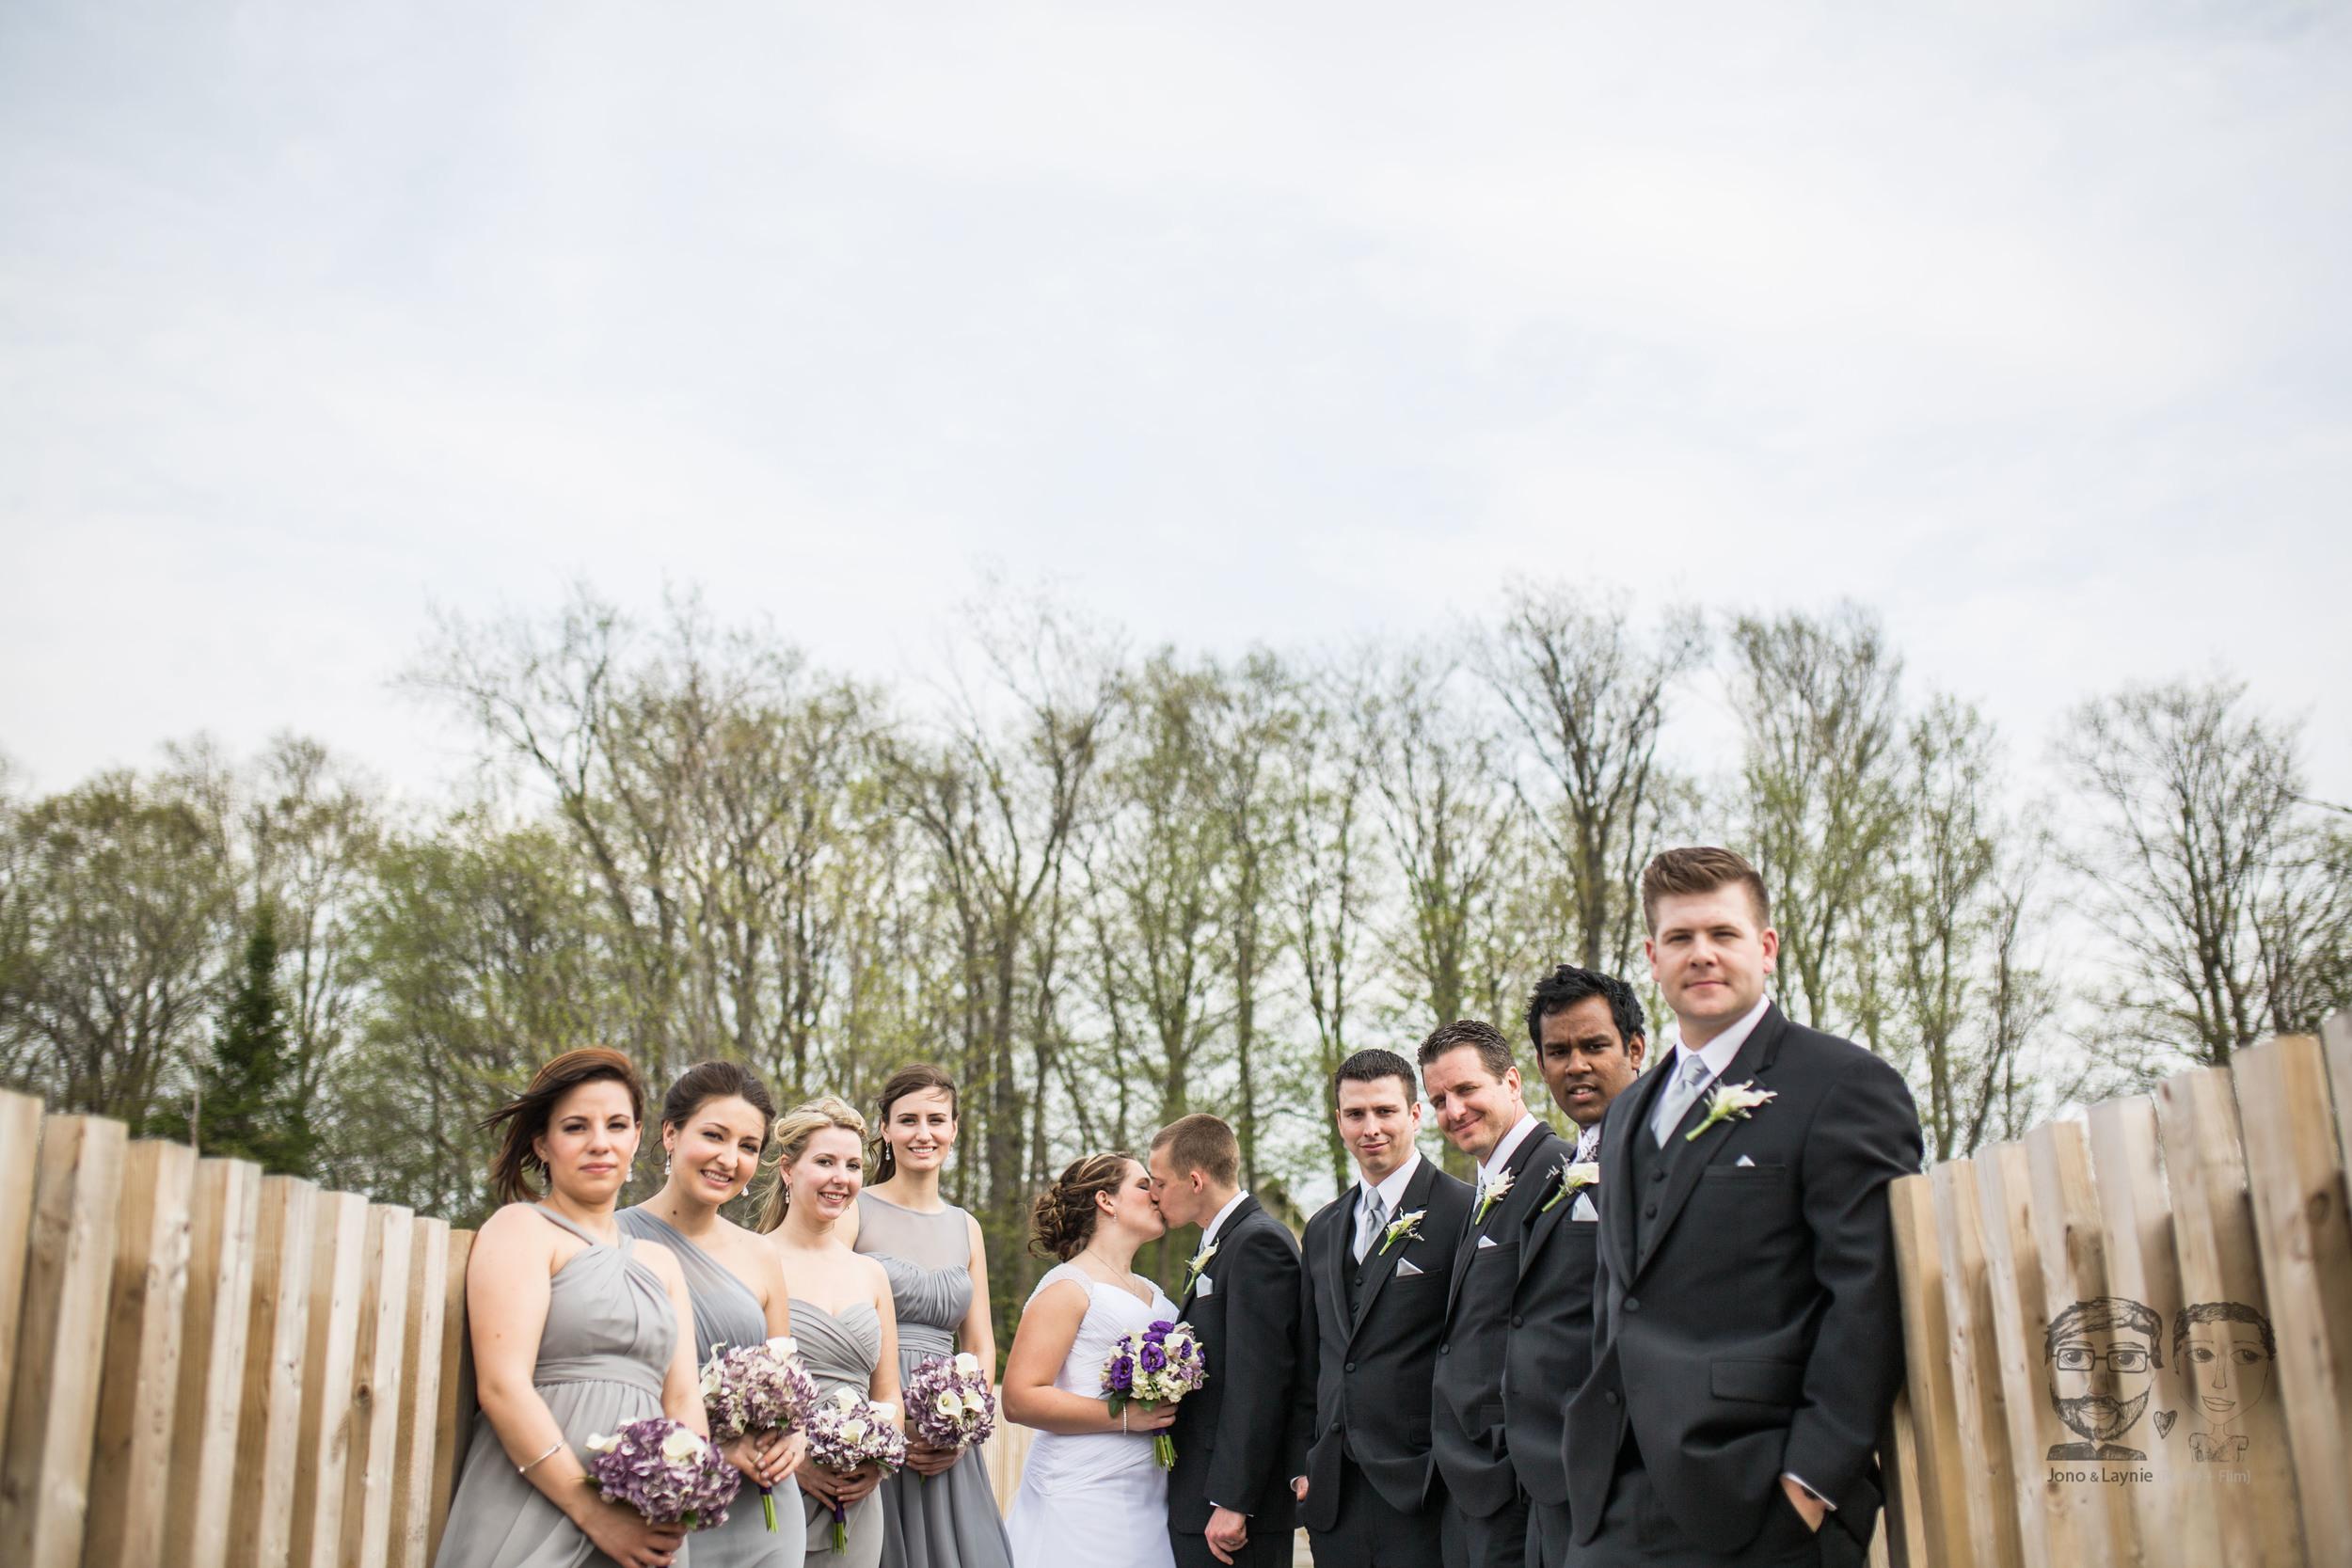 31Toronto Wedding Photographers and Videographers-Jono & Laynie Co.-Orangeville Wedding.jpg